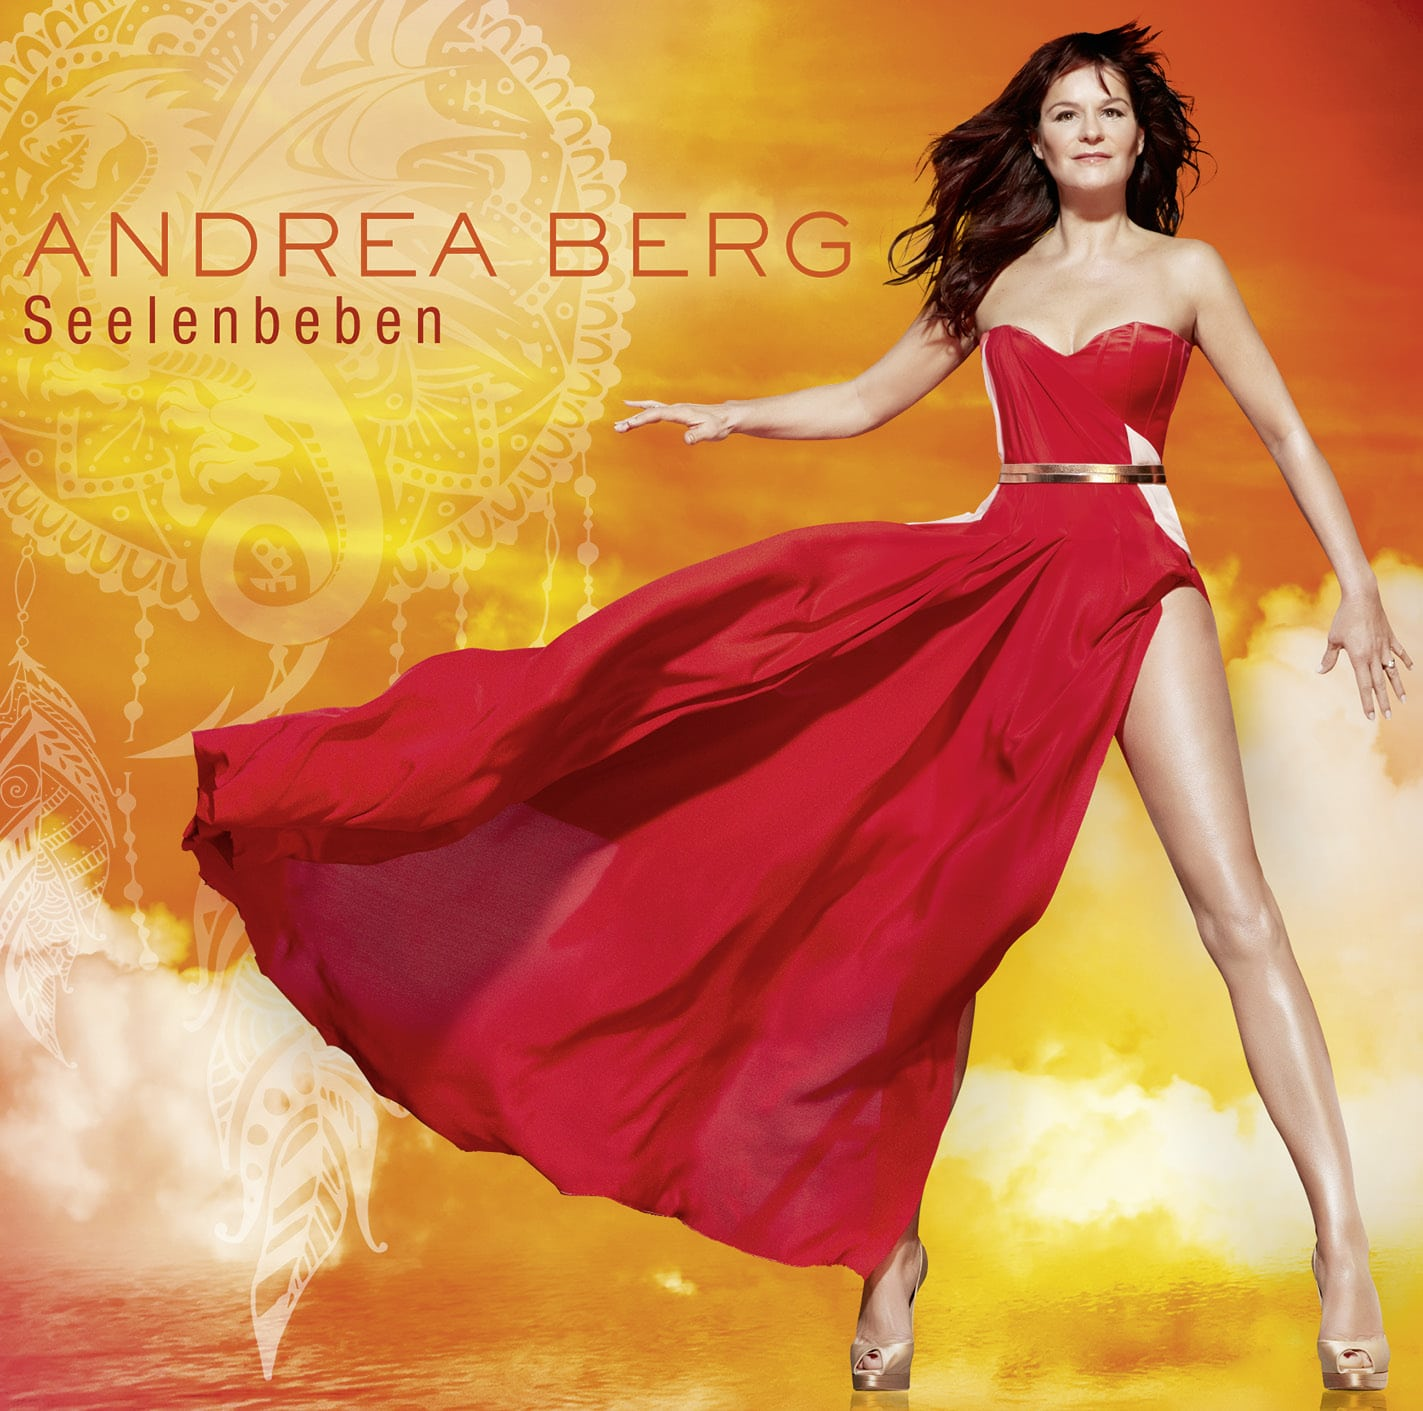 Andrea Berg - Seelenbeben-Tour 2016/17 copyright: Bergrecords (Sony Music)